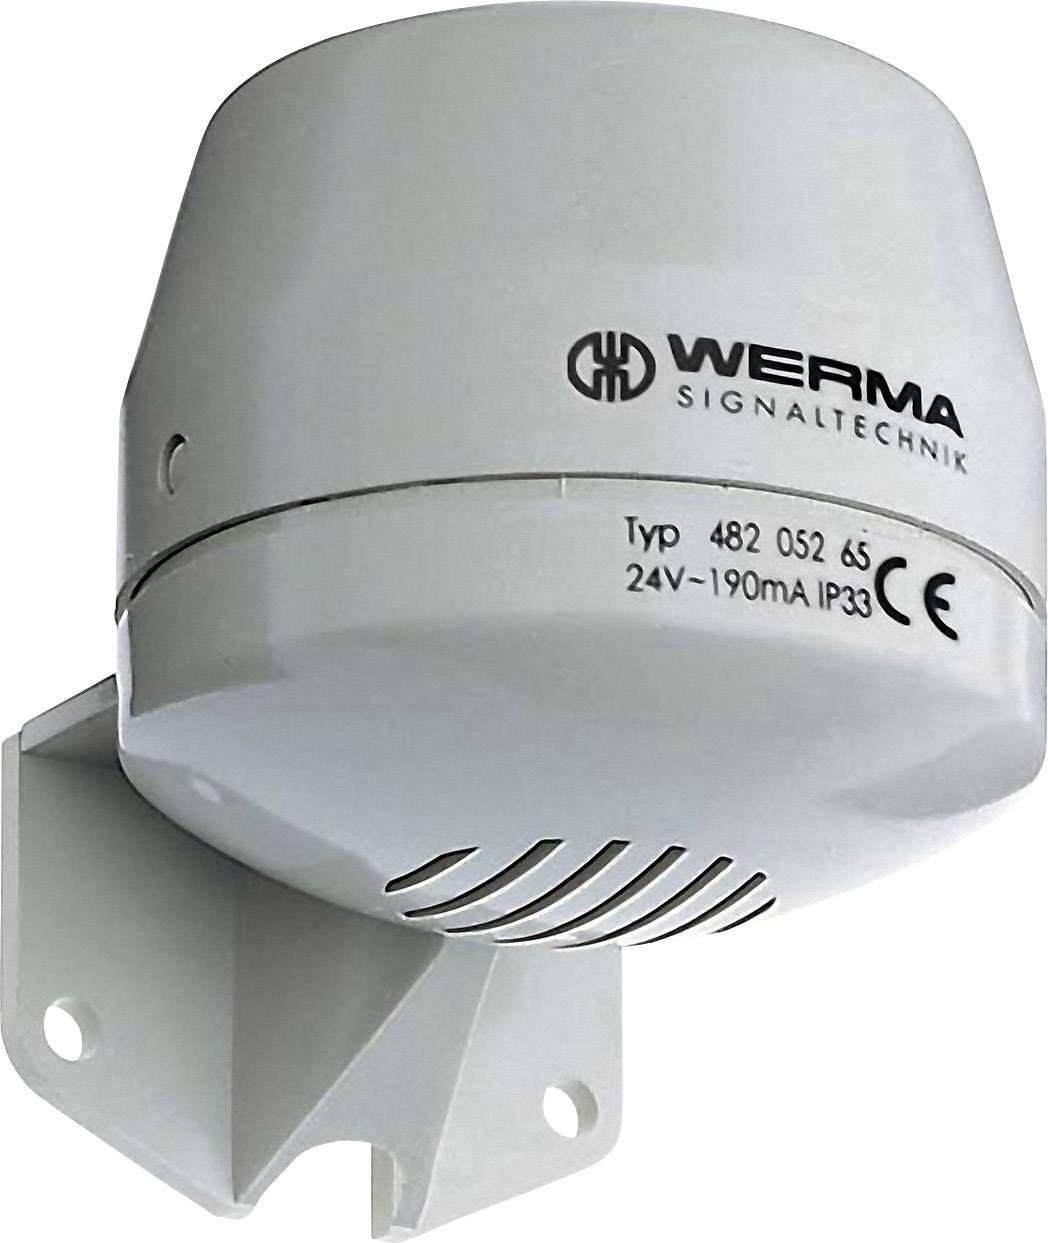 Siréna Werma Signaltechnik 482.052.55, stálý tón, 24 V/DC, 92 dB, IP33